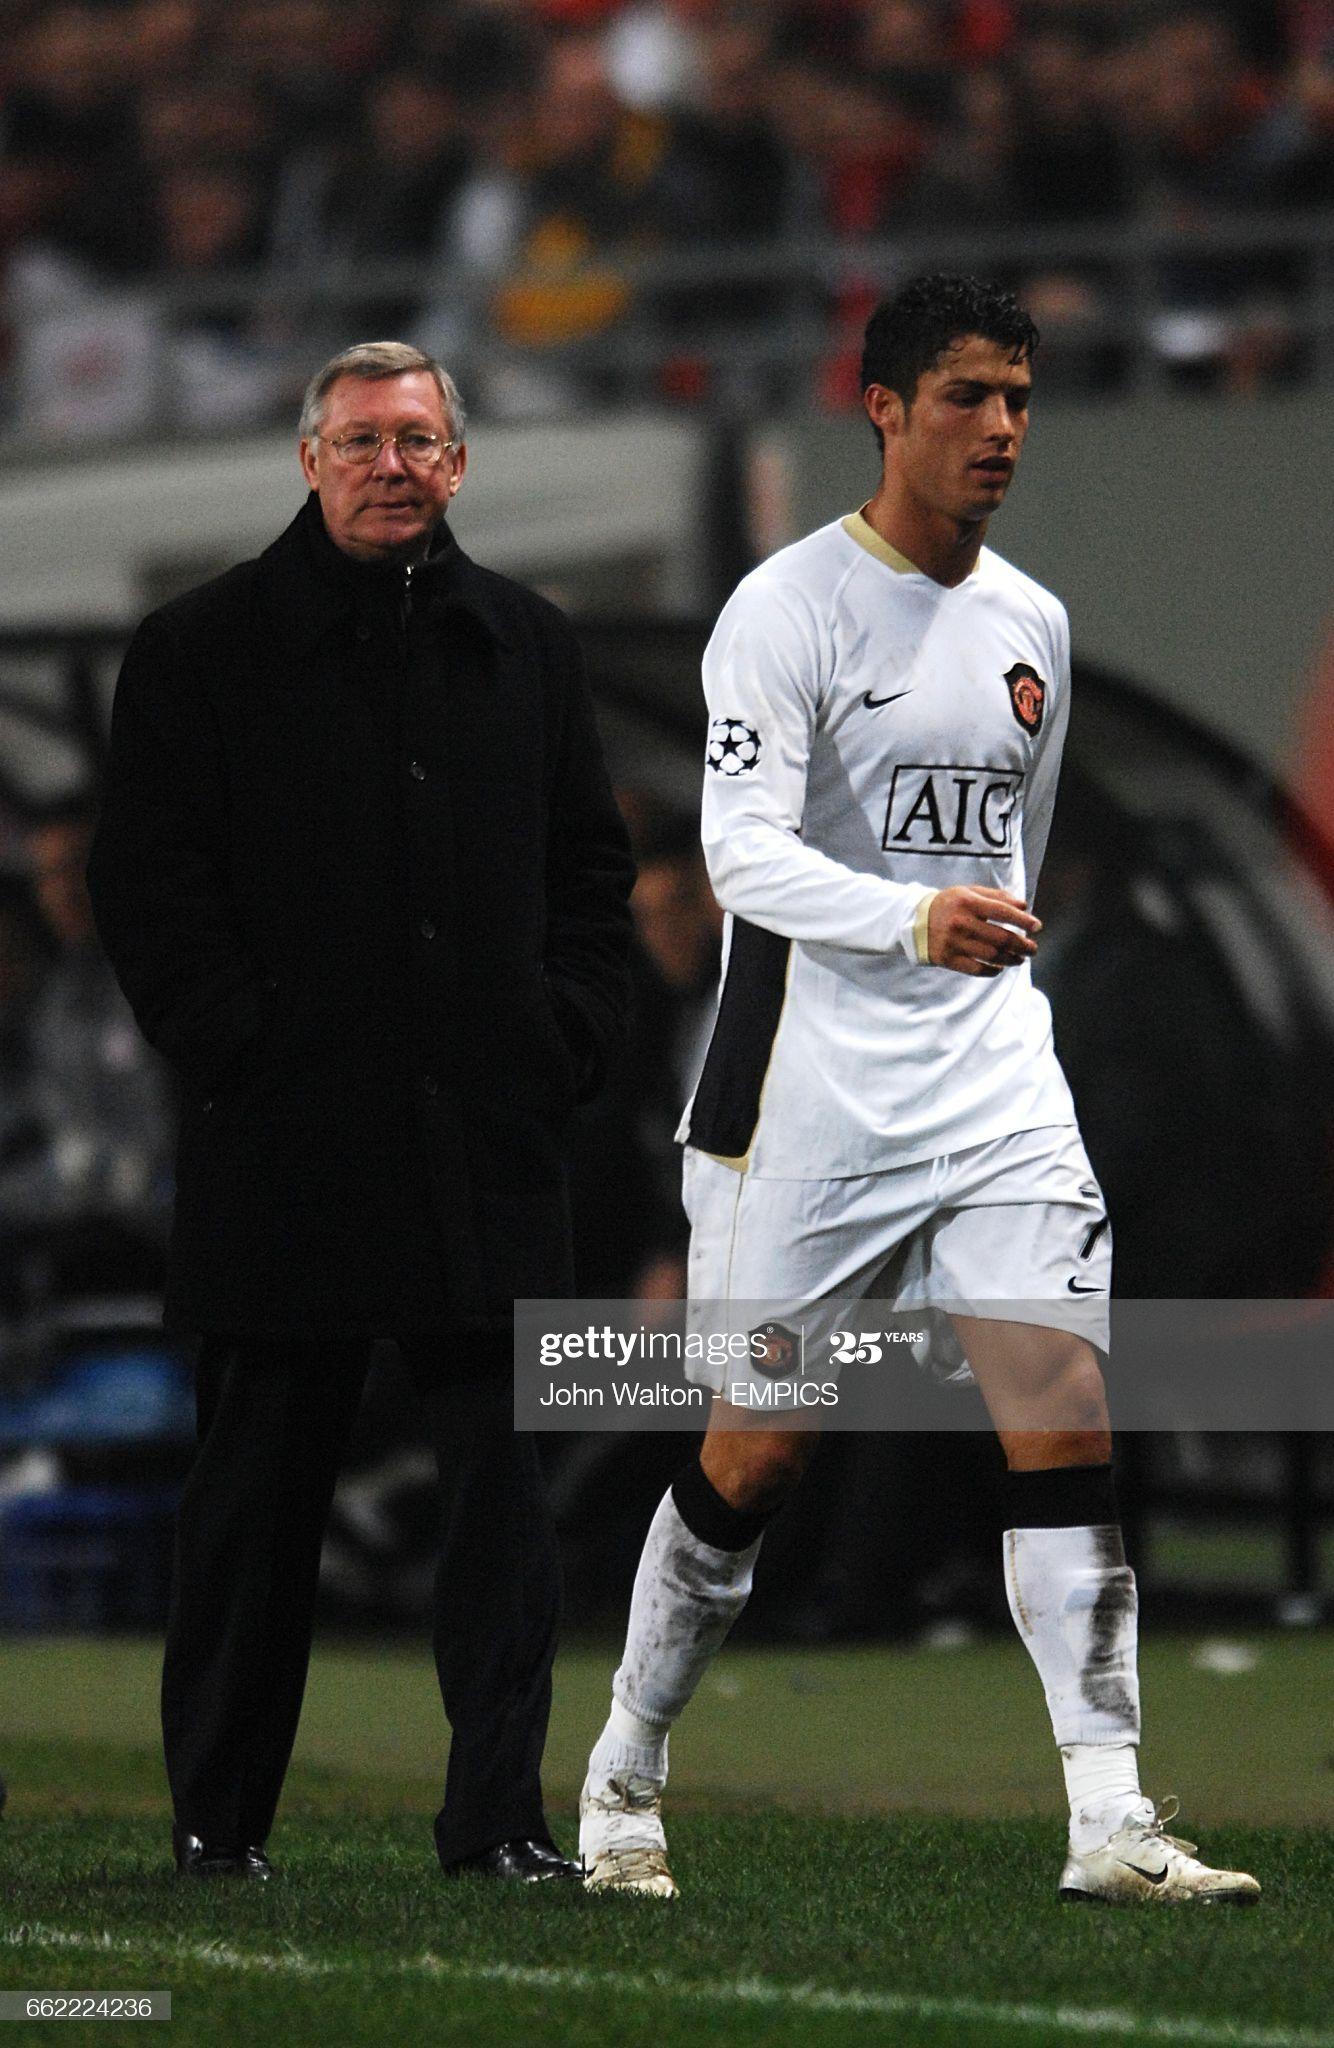 News Photo Manchester United Manager Alex Ferguson Looks At Cristiano Ronaldo Manchester Cristiano Ronaldo Cristoano Ronaldo